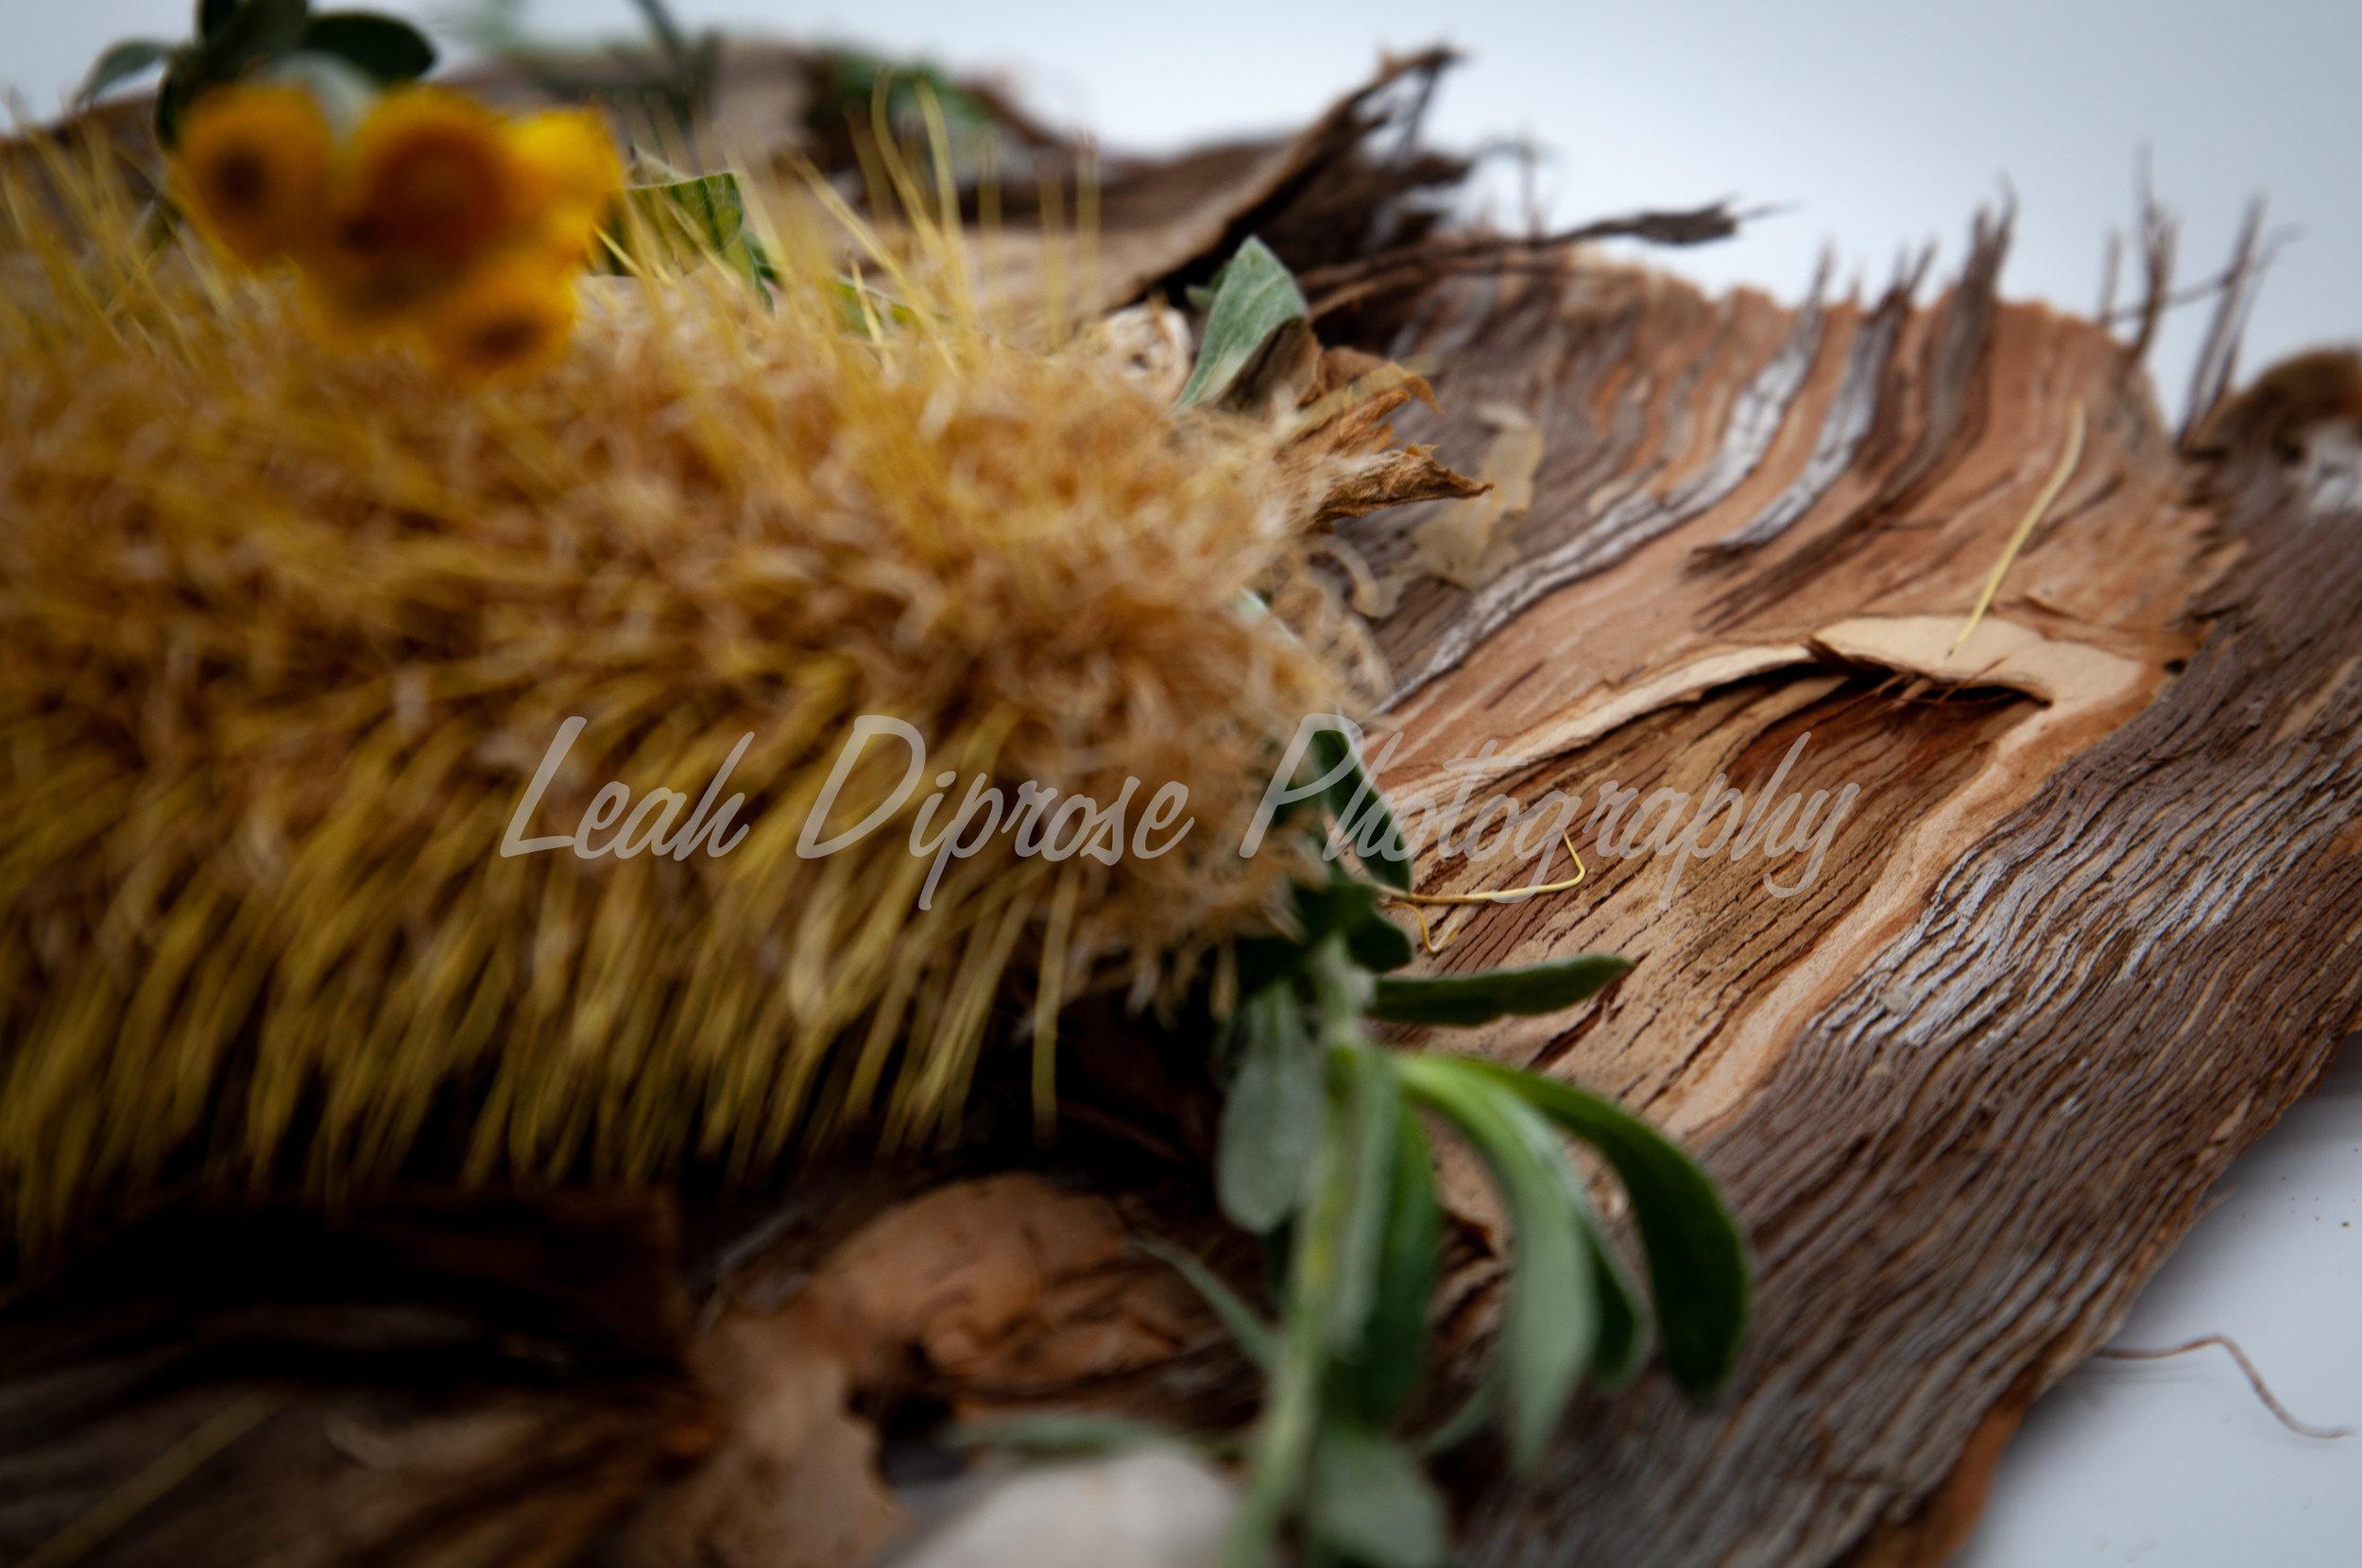 Leah Diprose Photography image-1585.jpg